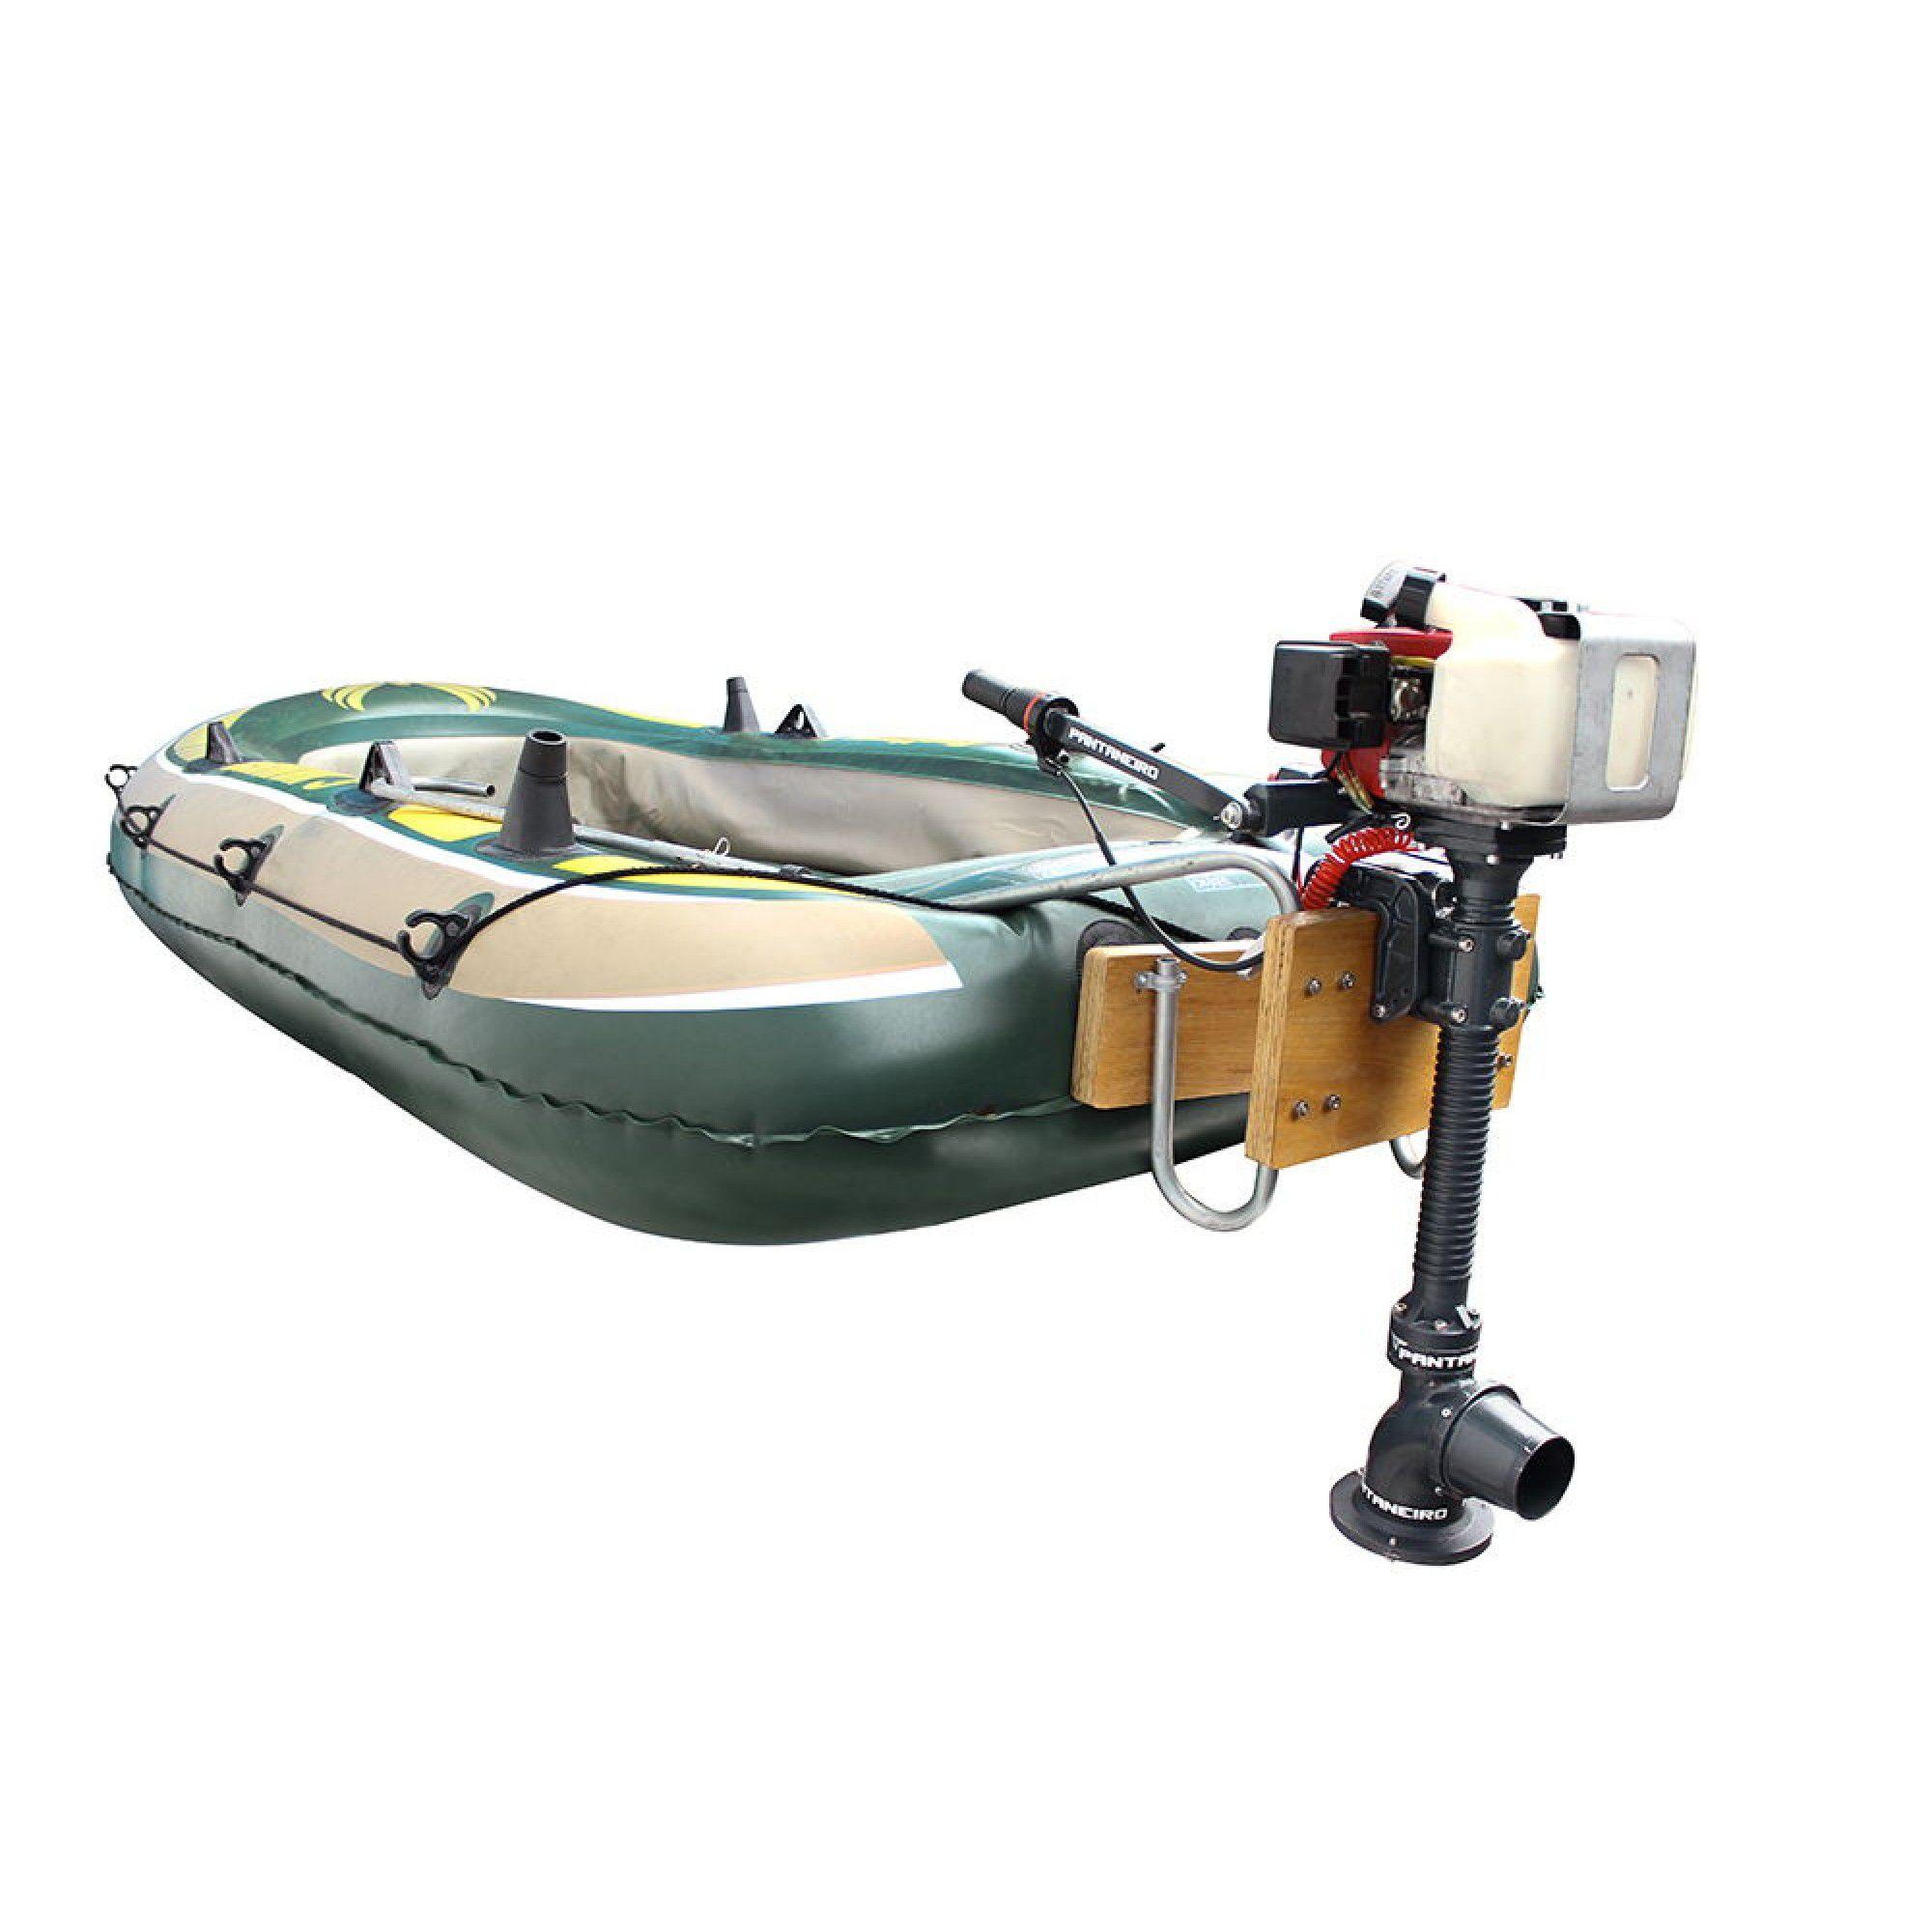 Bote Inflavel SeaHawk 400 + Suporte Motor -  Intex #68351